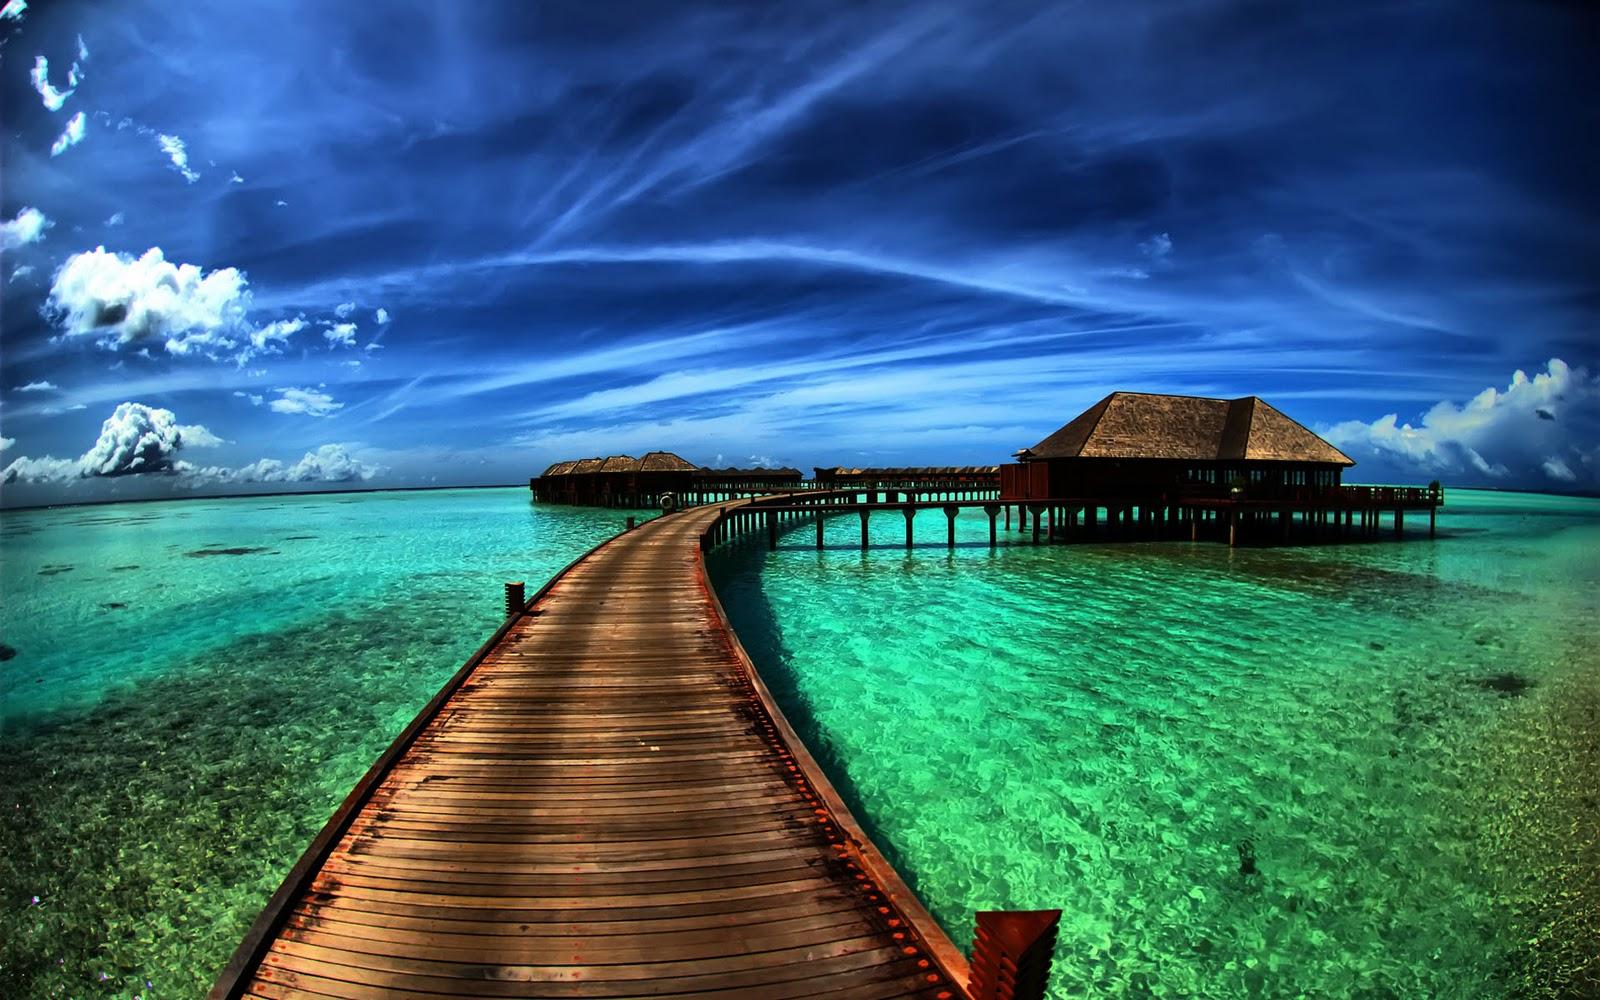 http://1.bp.blogspot.com/-zchKo3Urt60/TuJ-rF52FSI/AAAAAAAAA7E/tT_bBjo5lek/s1600/paradise+wallpaper+desktop1.jpg